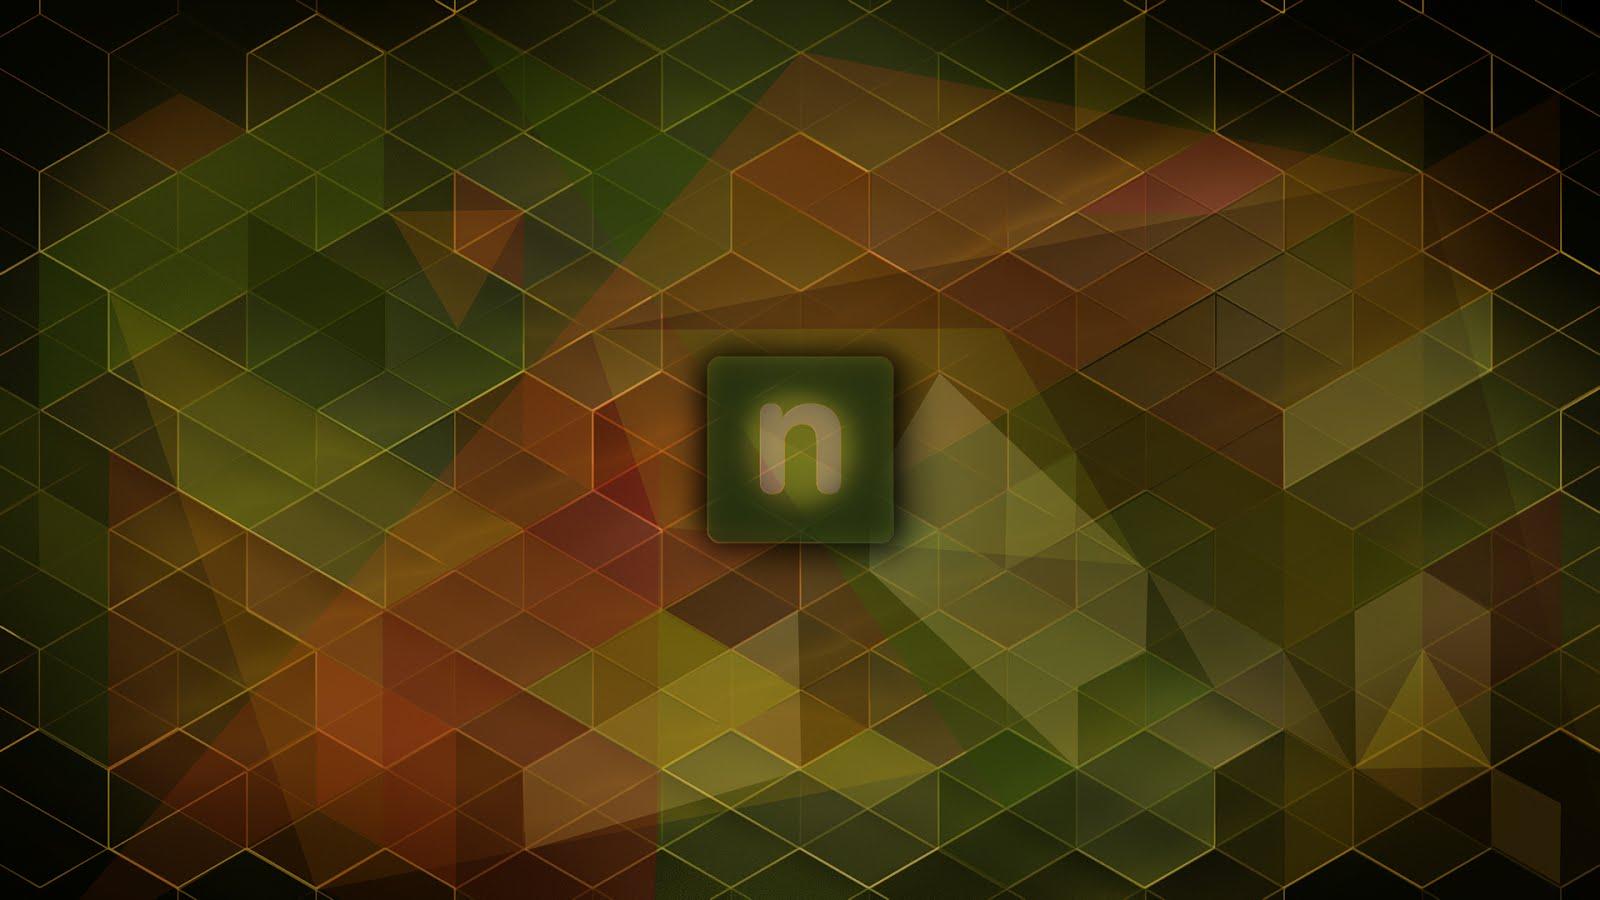 Wallpaper Design for Nsquared